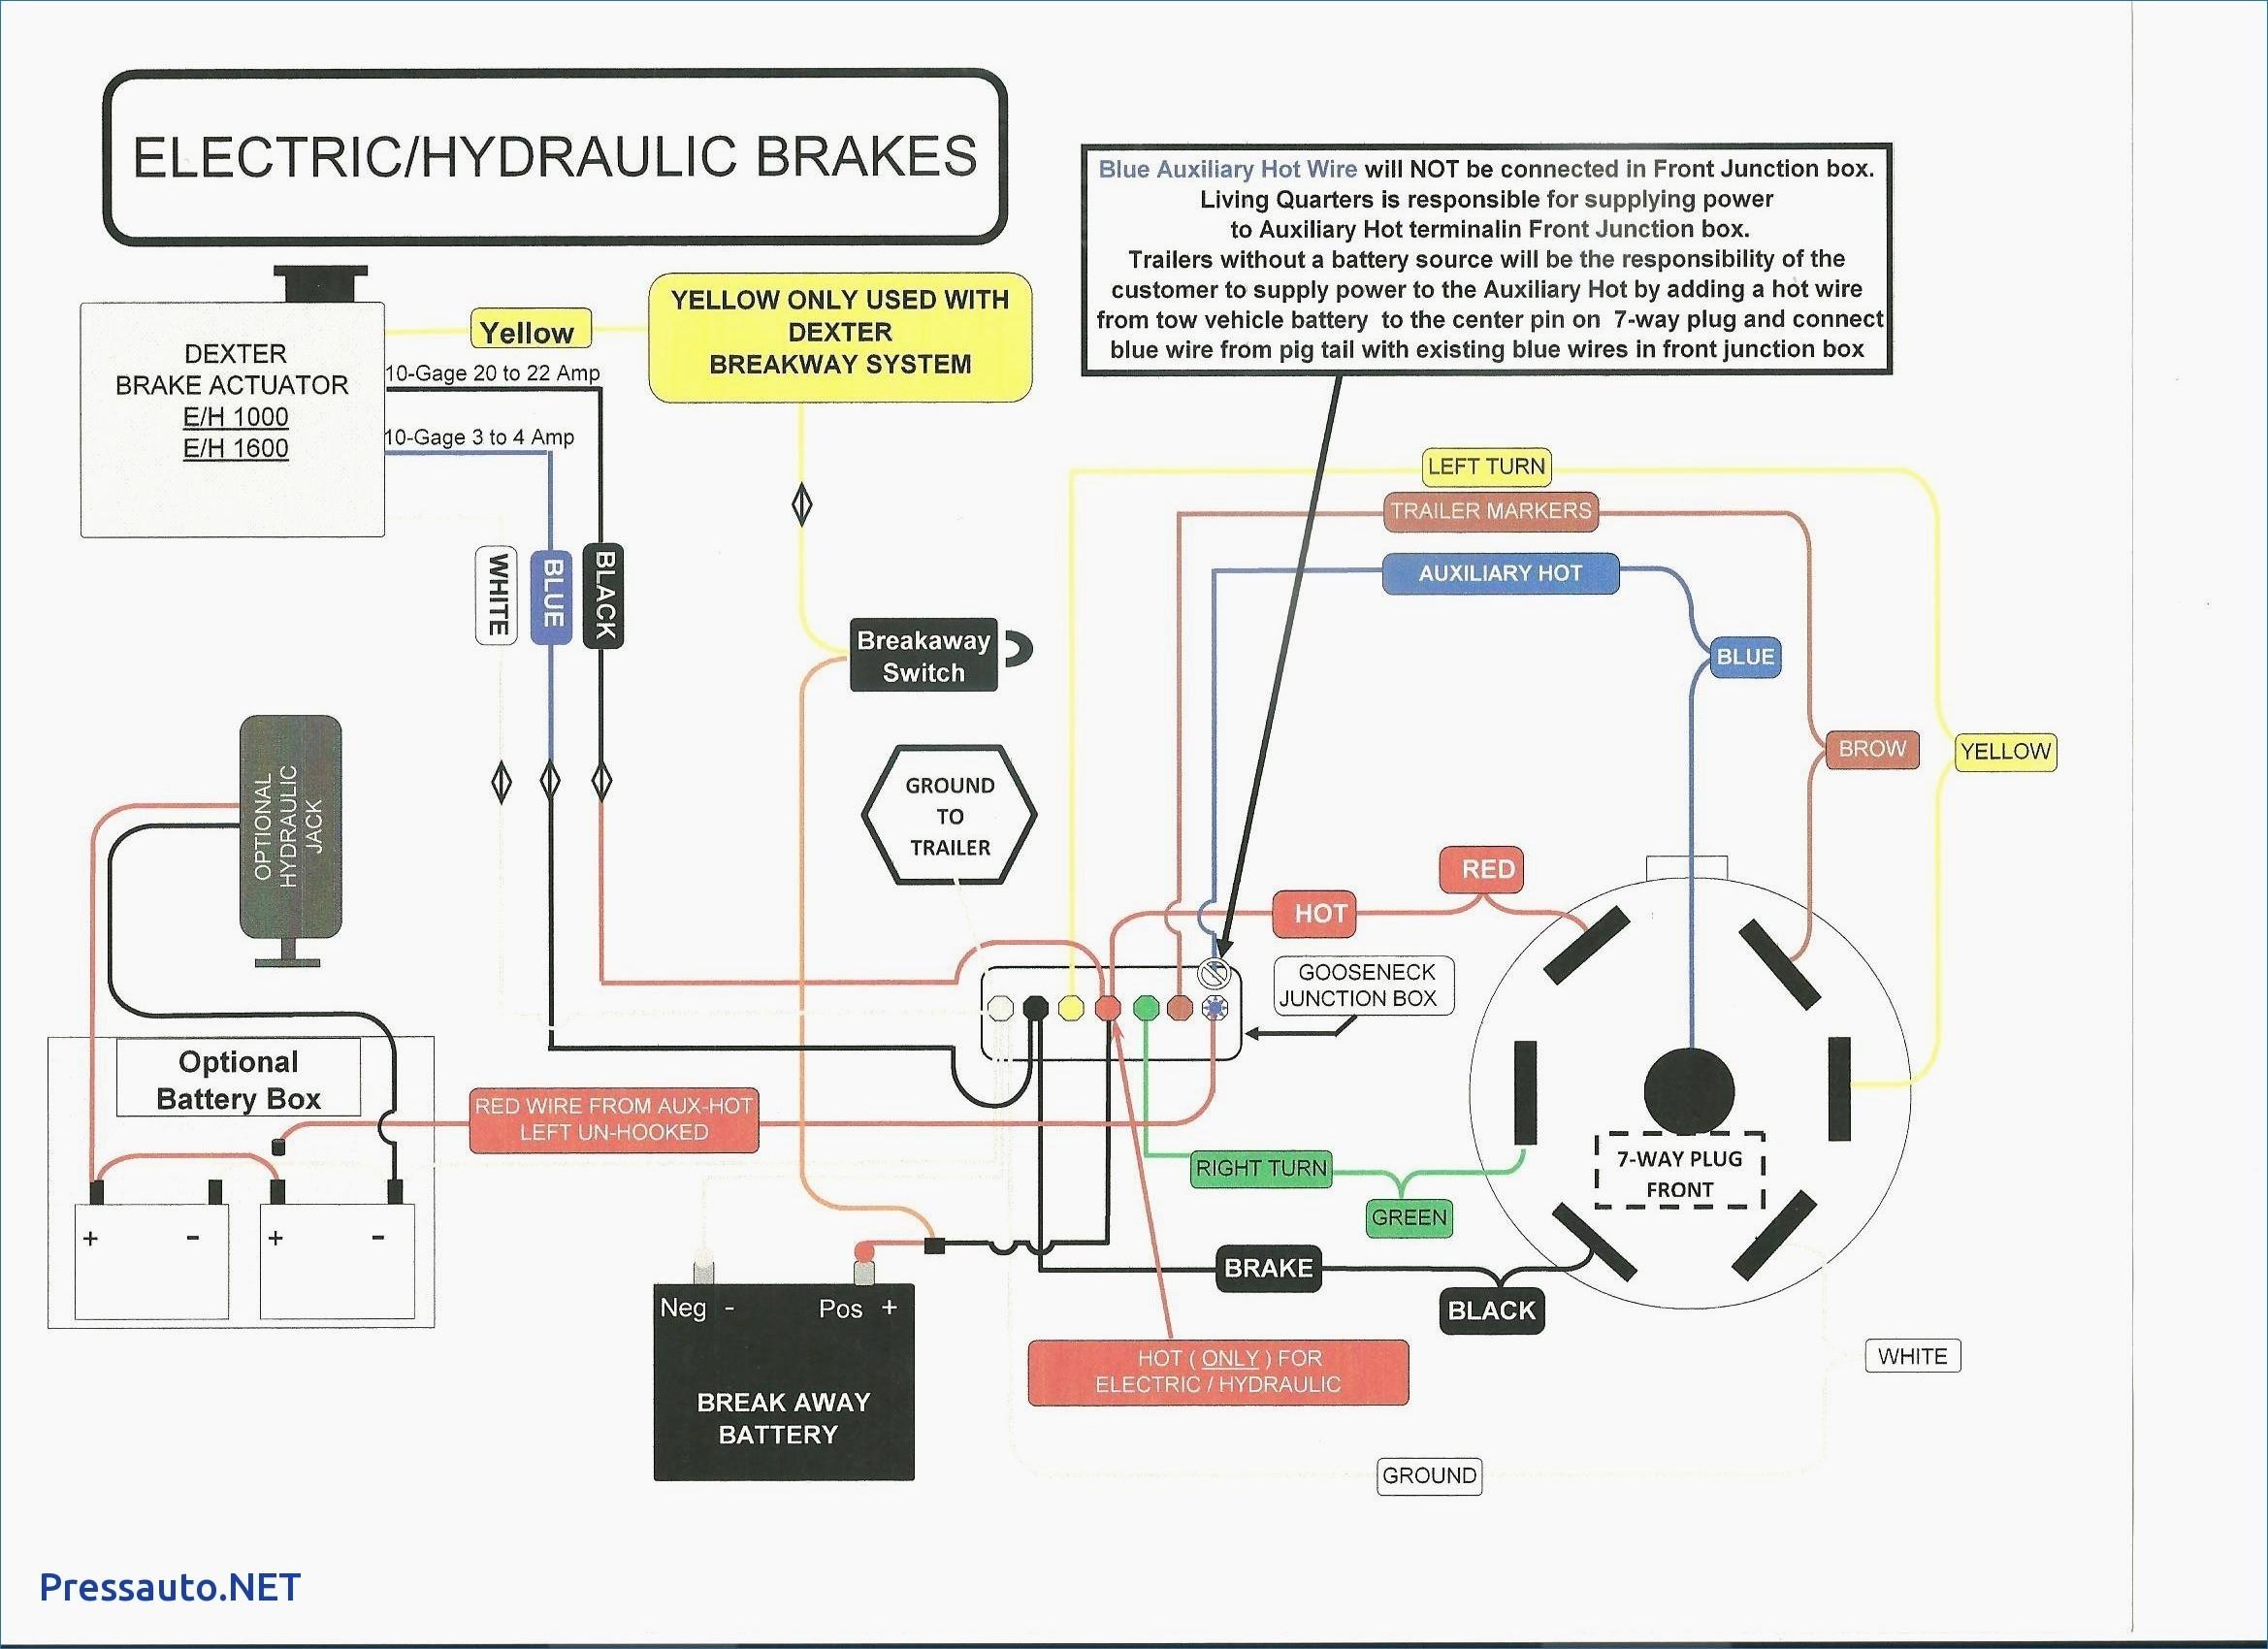 Breakaway Switch Wiring Diagram Lights Of Breakaway Switch Wiring Diagram